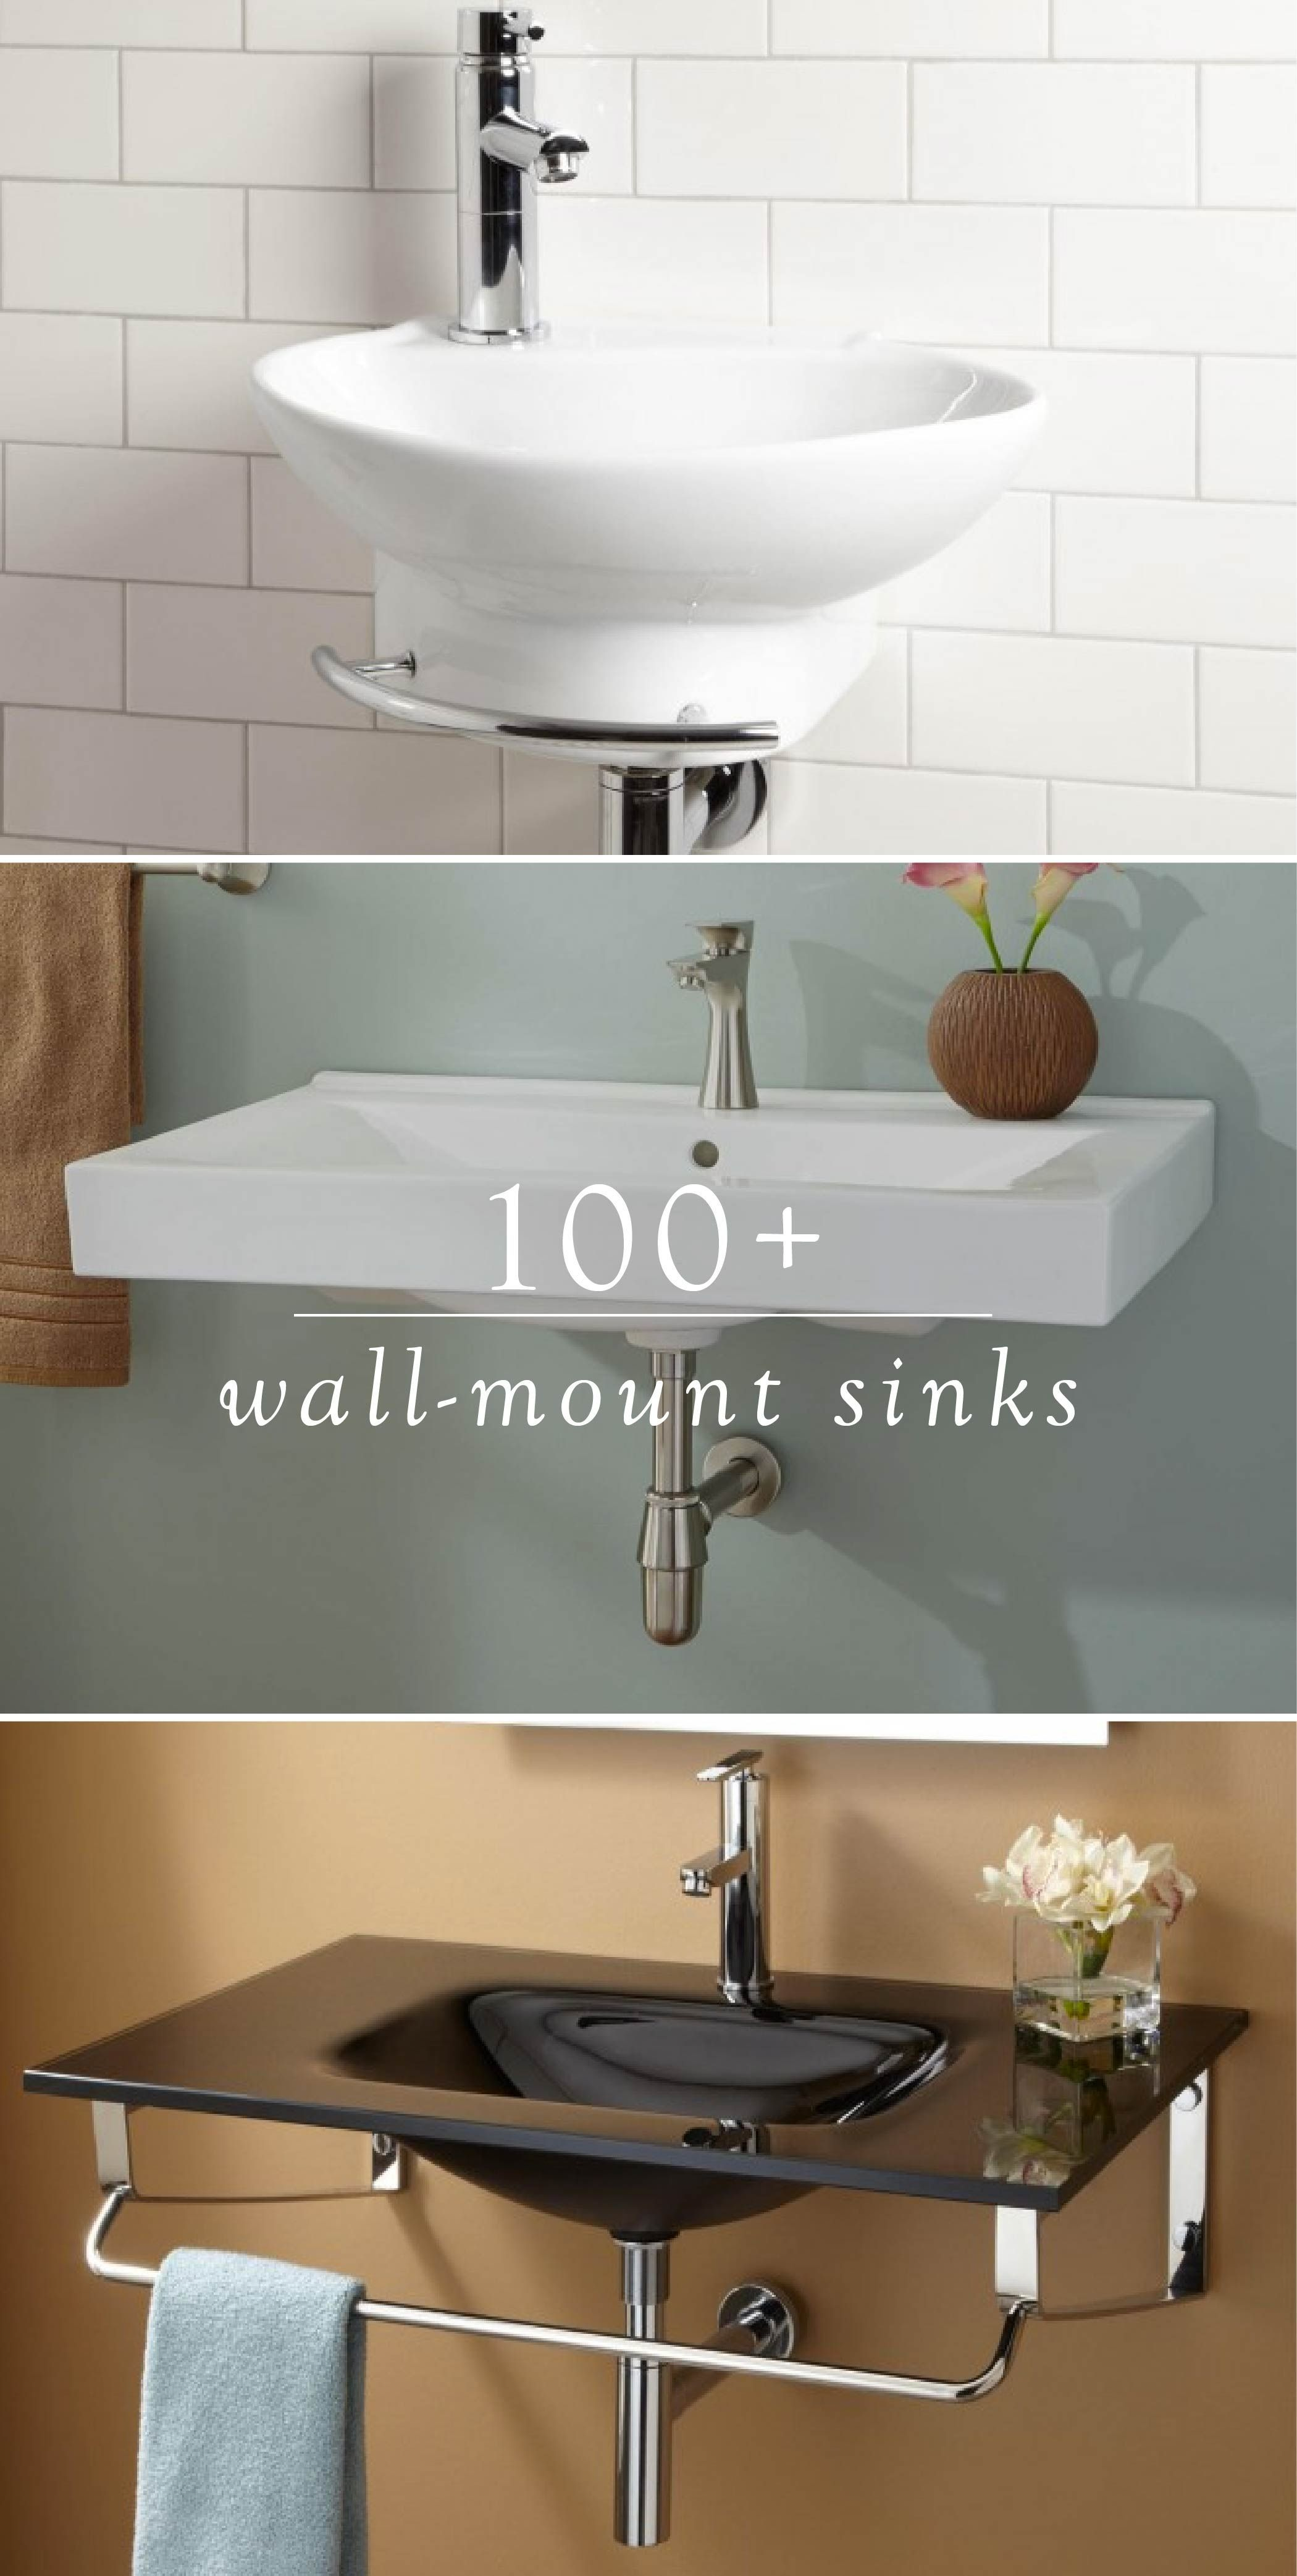 Corrie Mini Wall Mount Bathroom Sink Wall Mount Sinks Bathroom Sinks Bathroom Wall Mounted Bathroom Sinks Wall Mounted Sink Sink